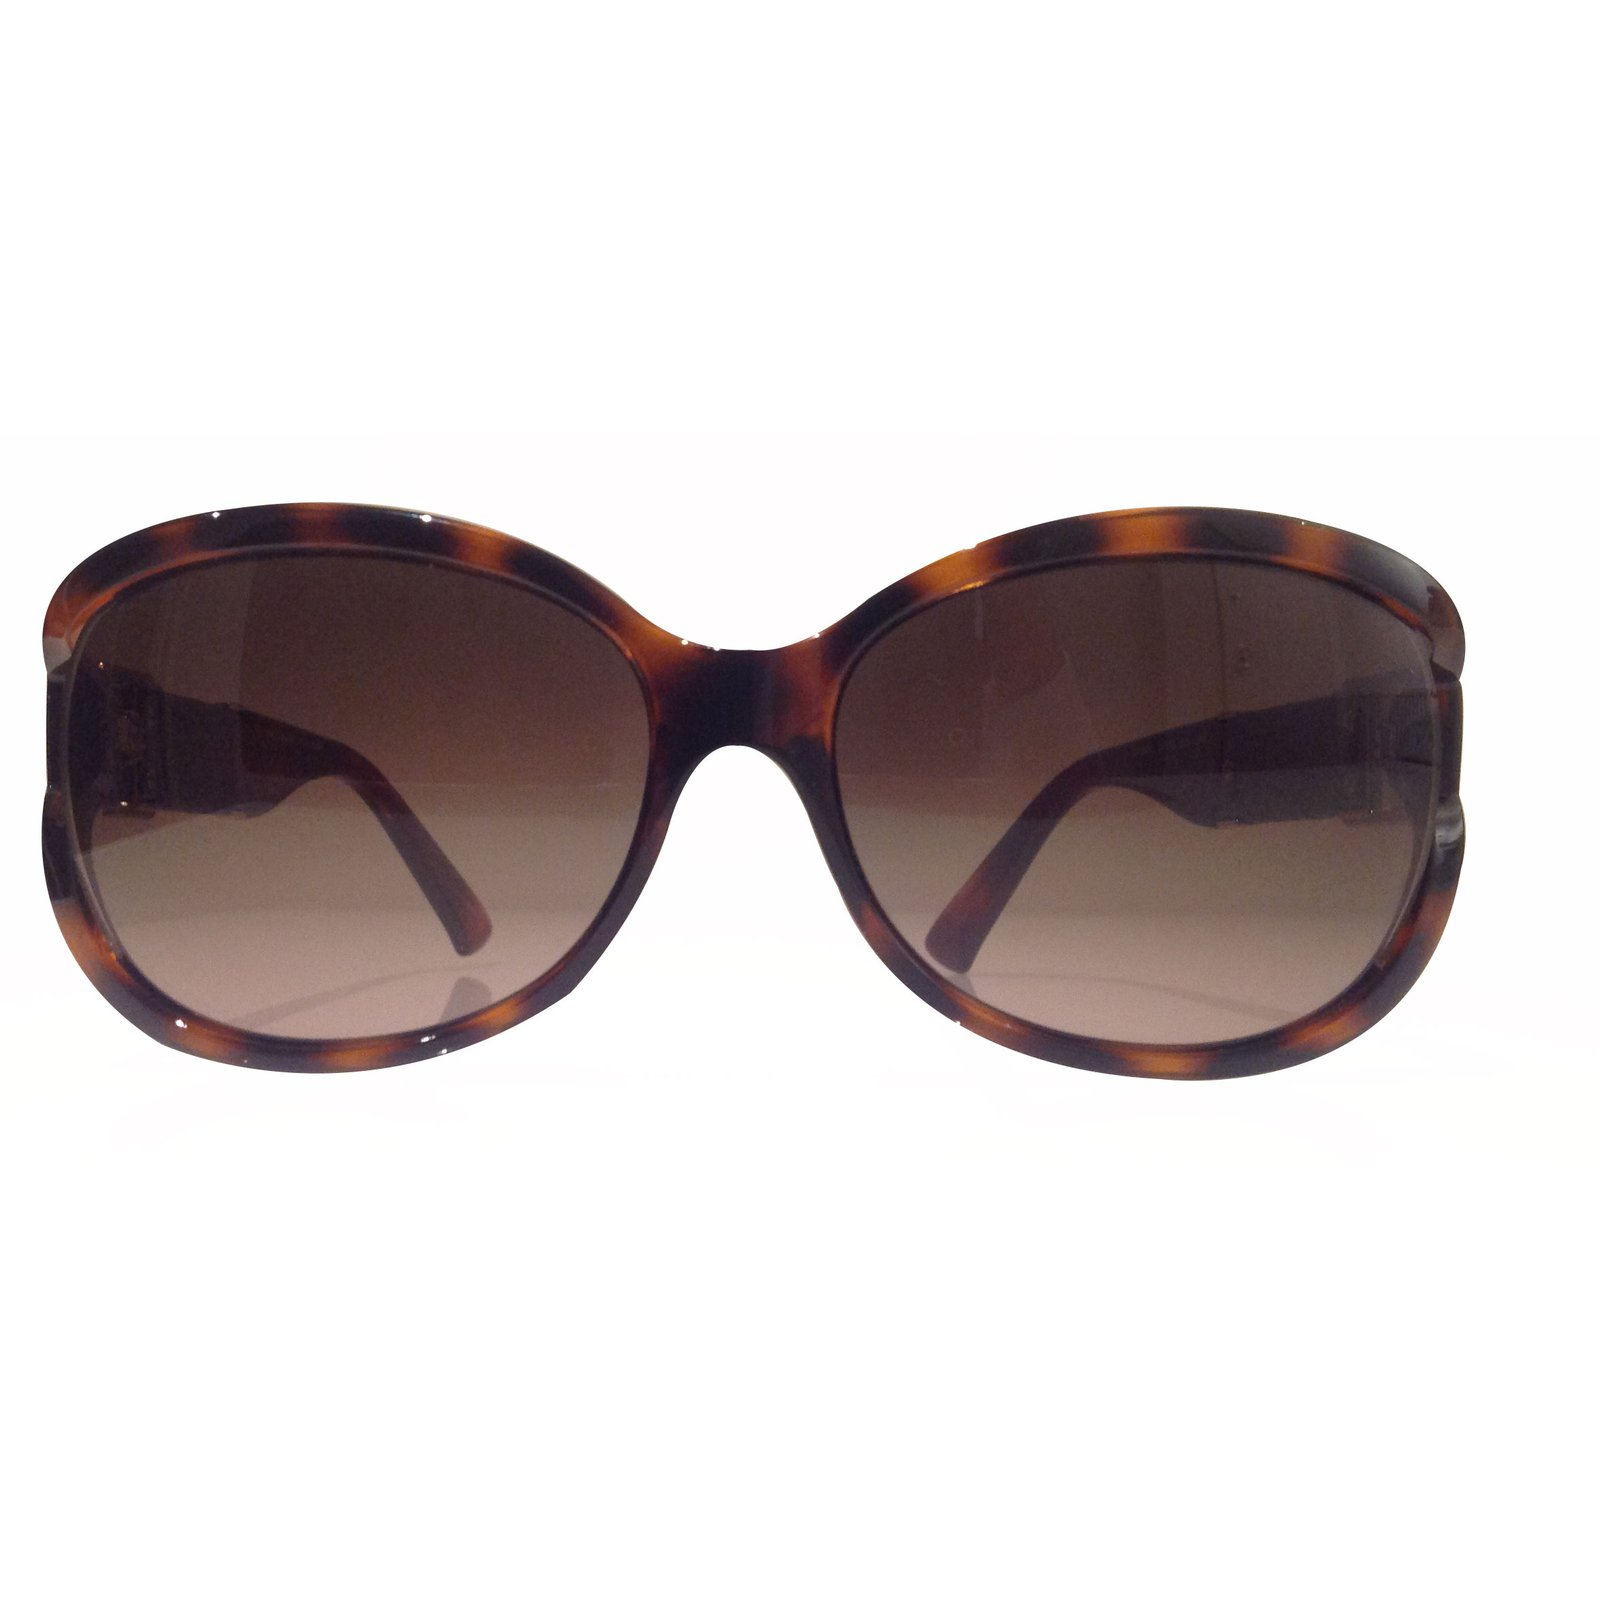 85f22f3c82 Fendi Sunglasses Sunglasses Plastic Brown ref.18979 - Joli Closet